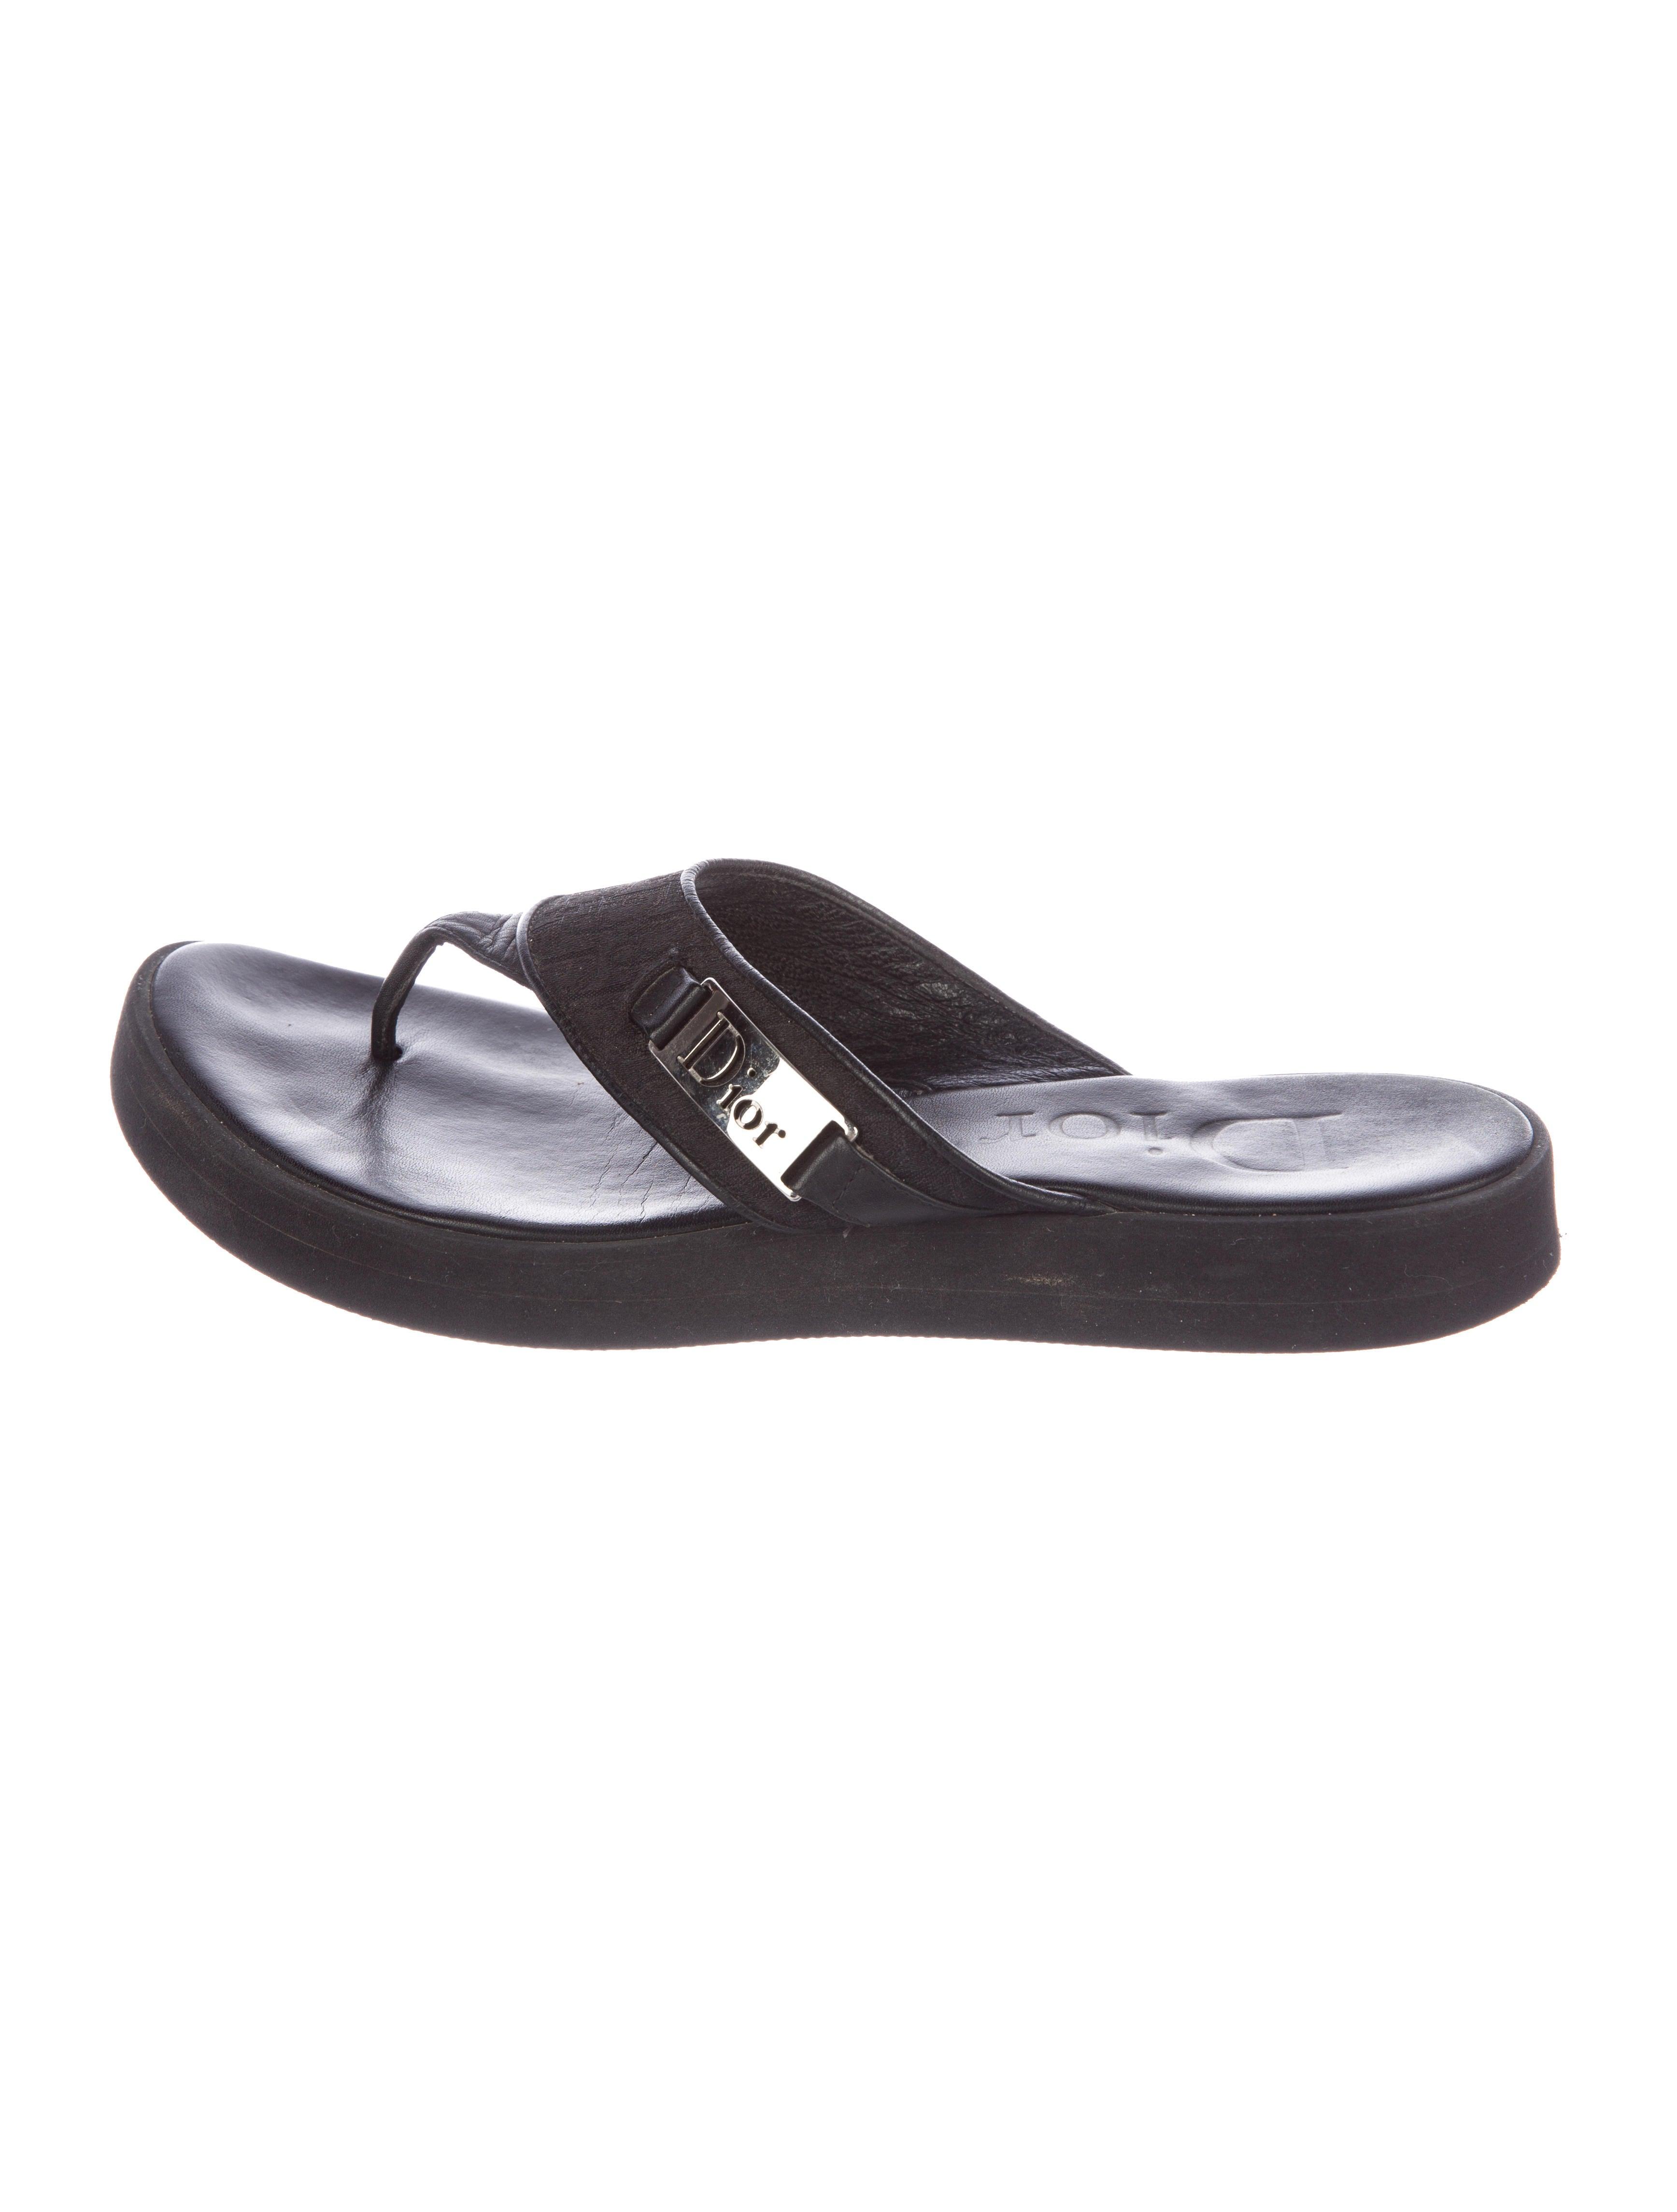 Christian Dior Monogram Thong Sandals quality outlet store PFTtBDWhqJ